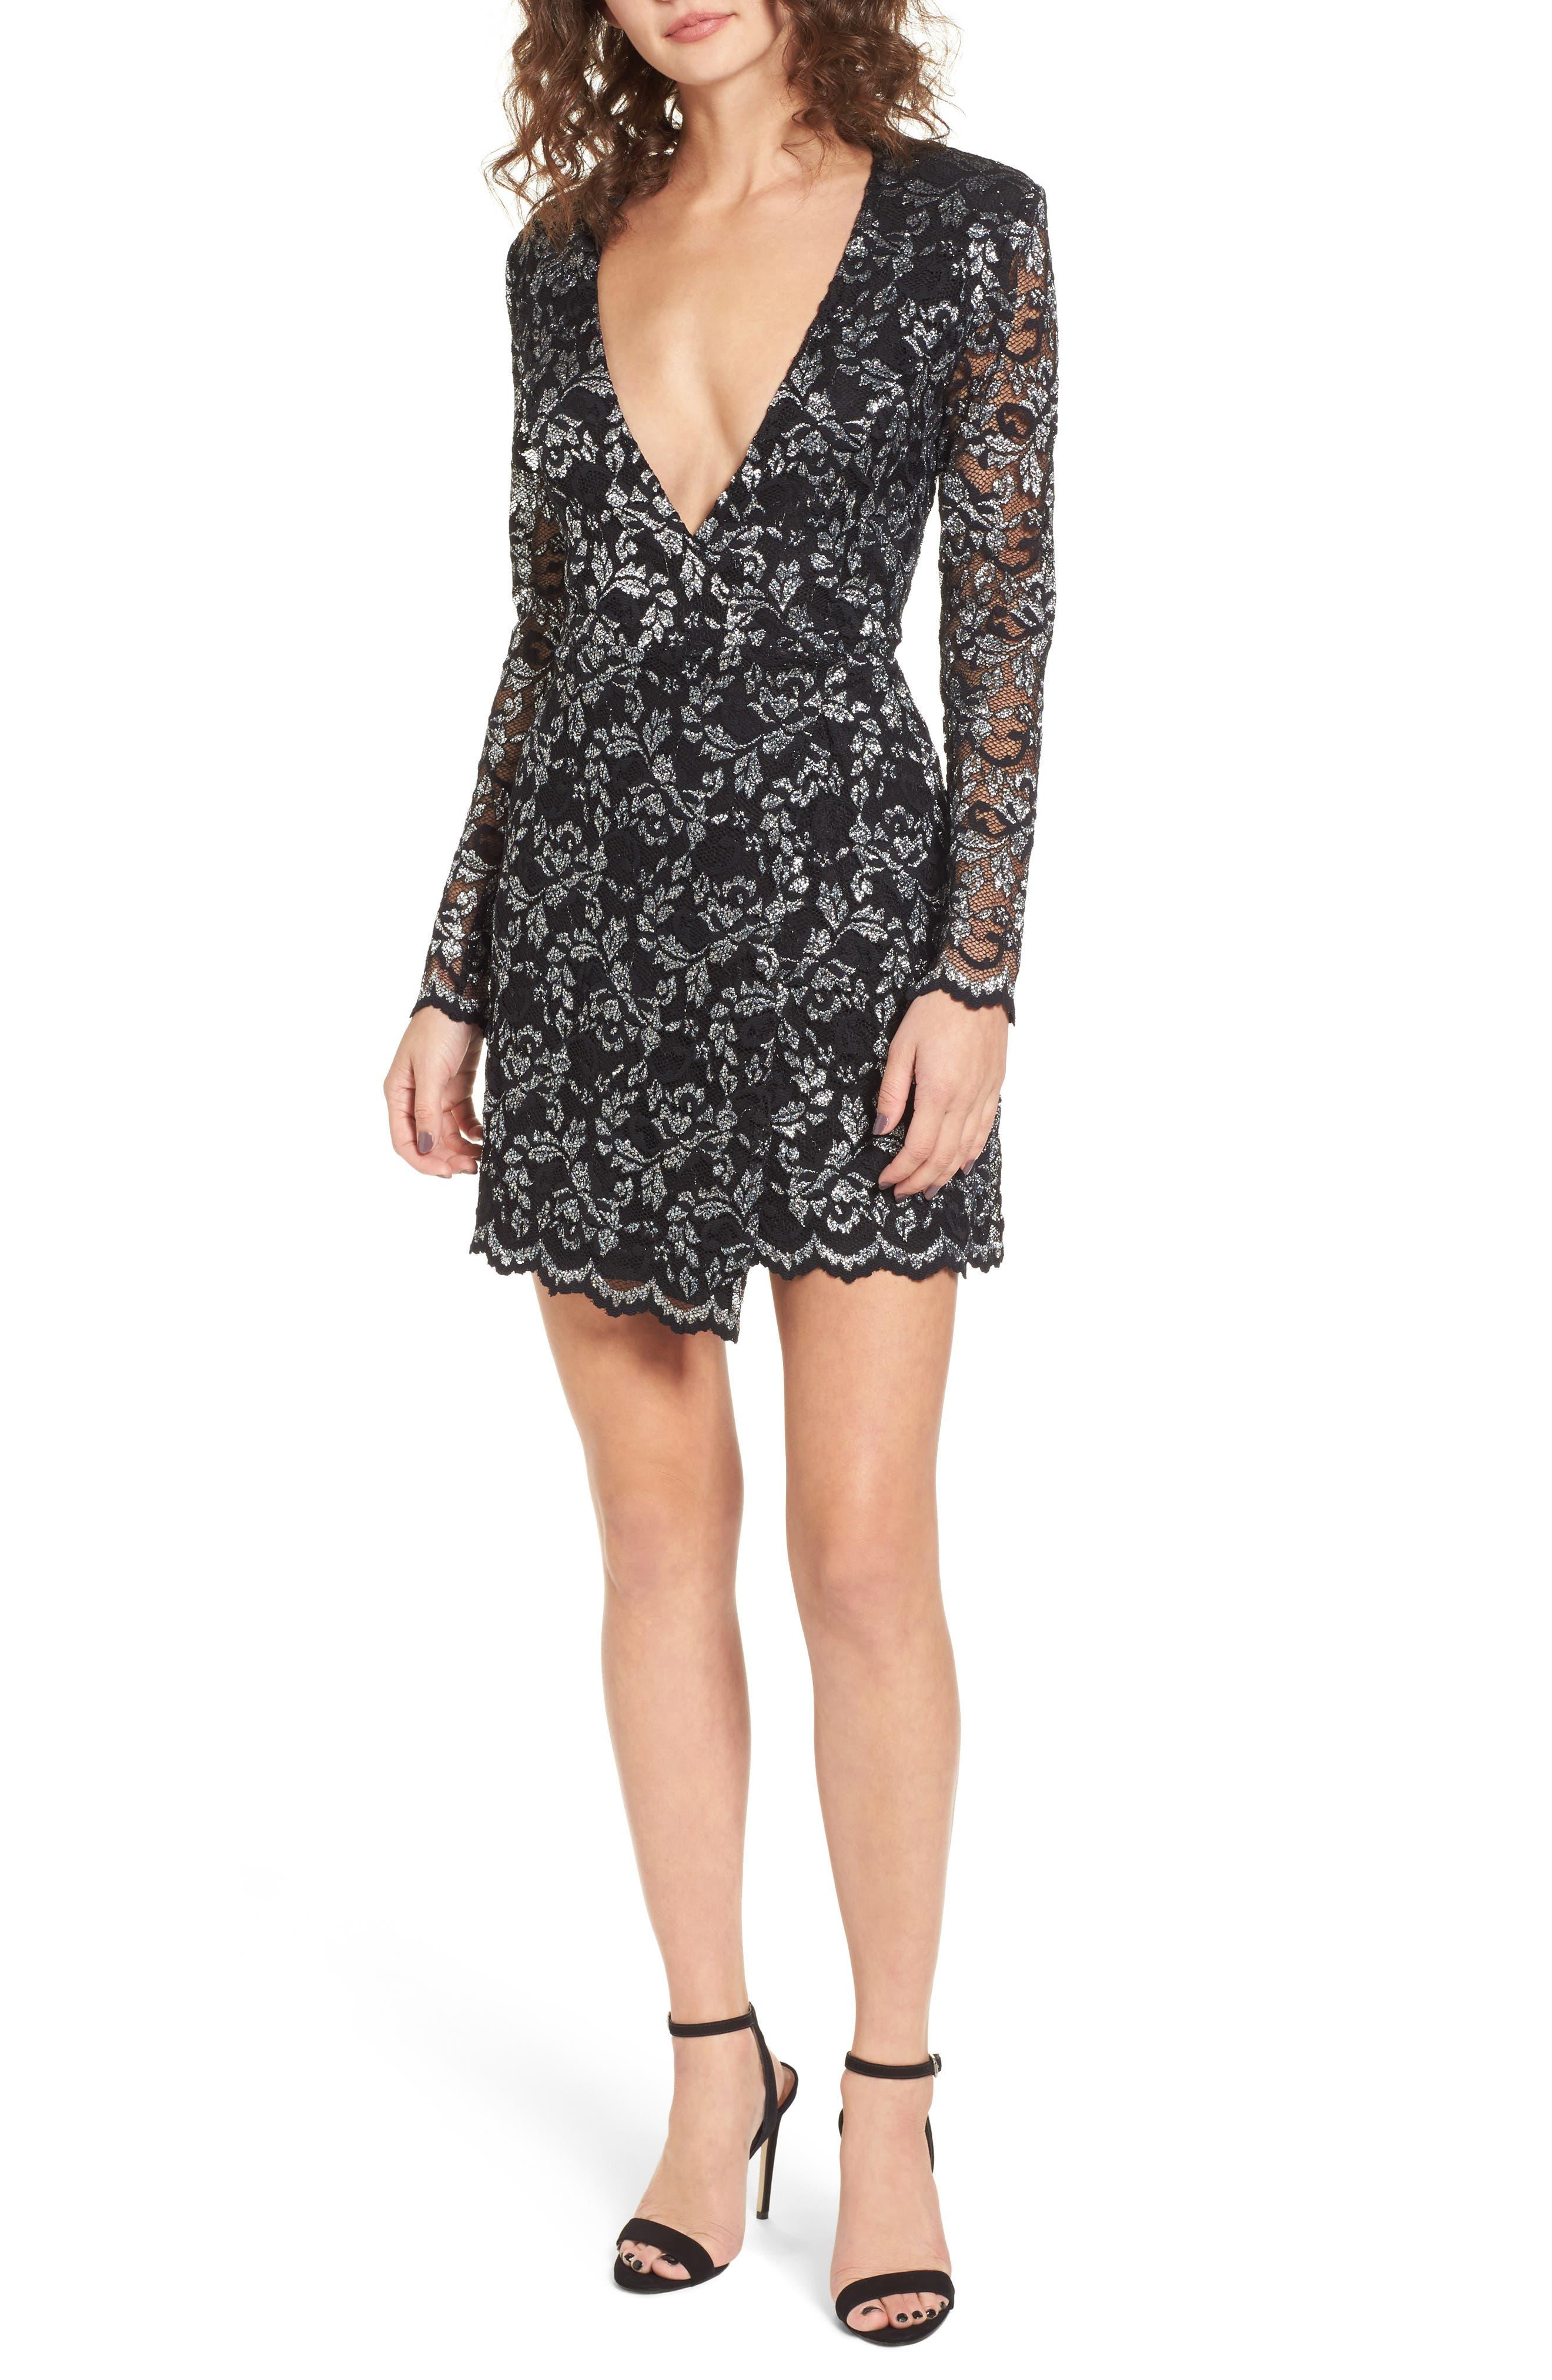 Laney Metallic Lace Wrap Dress,                         Main,                         color, Black/ Silver